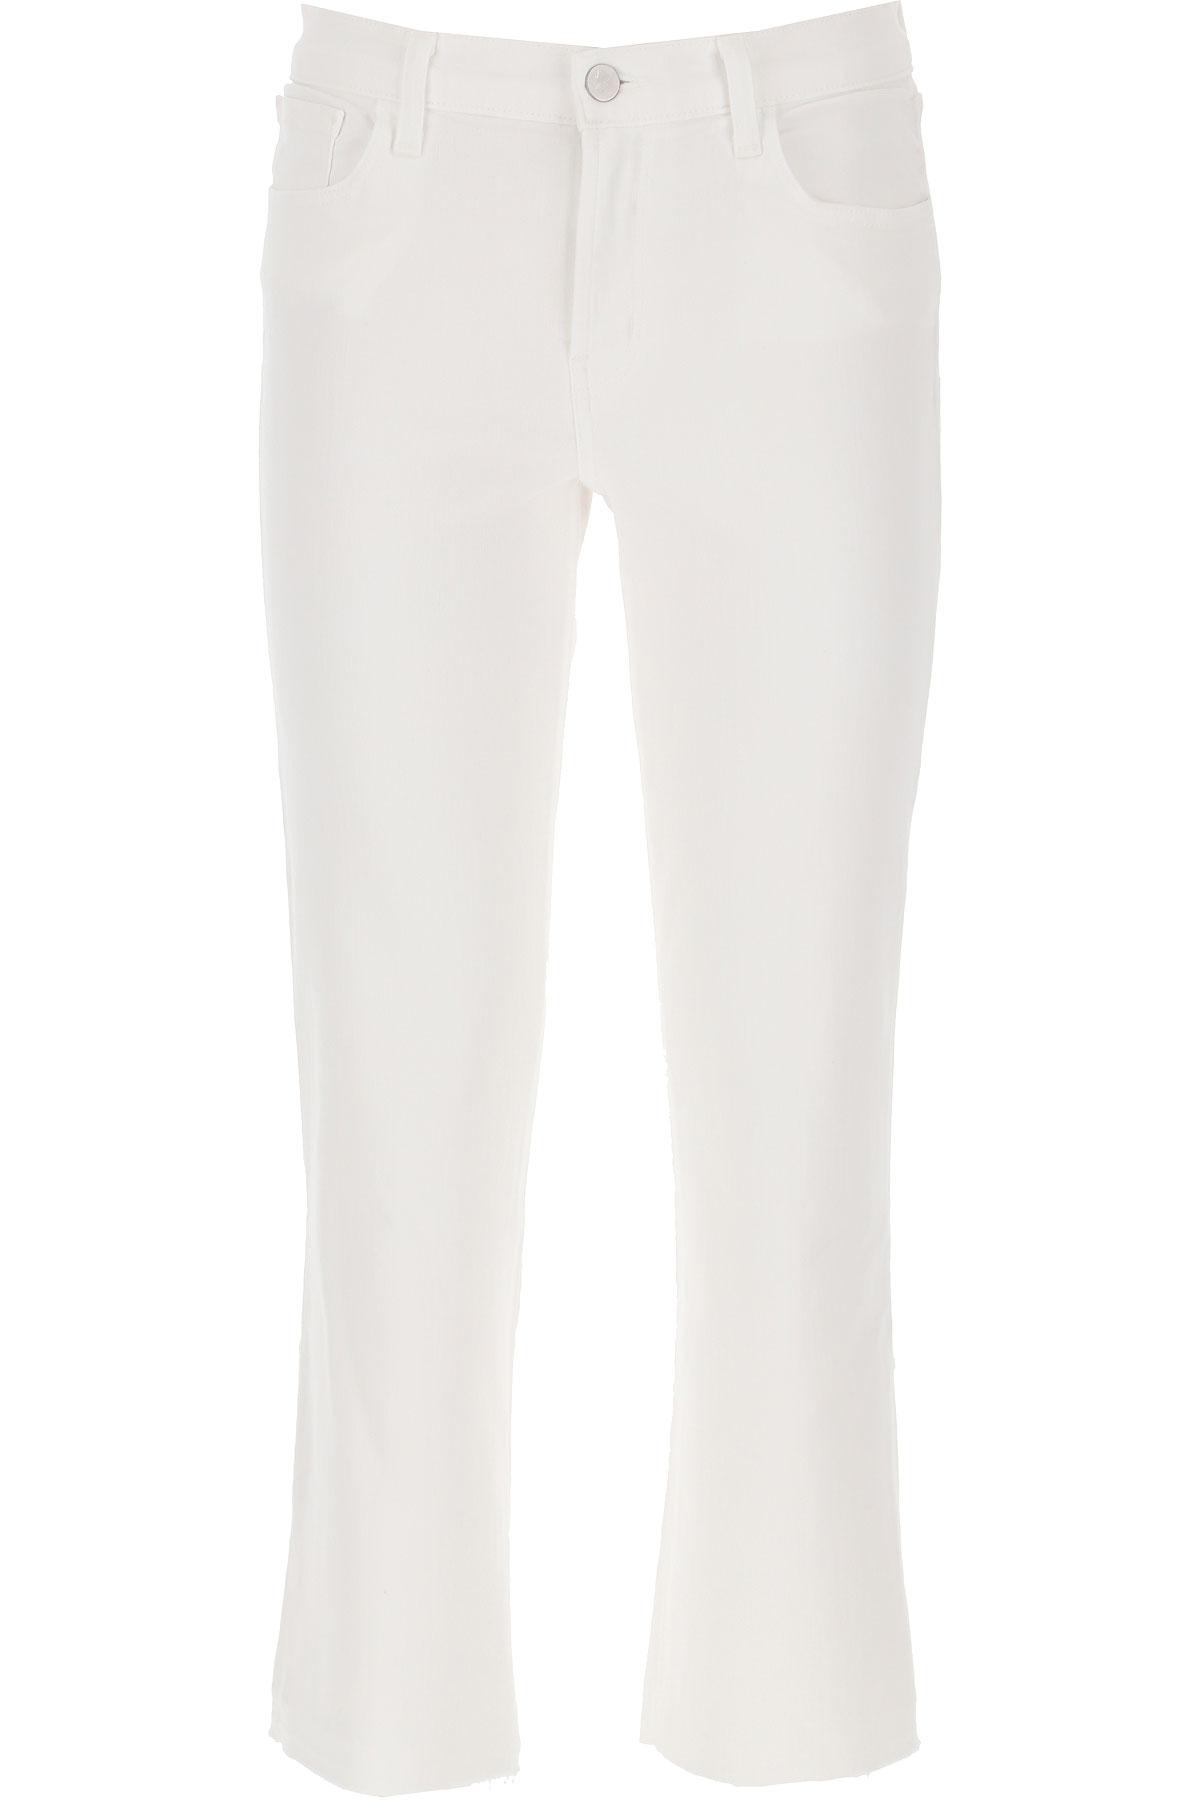 J Brand Jeans On Sale, White, Cotton, 2019, 24 25 26 27 28 29 30